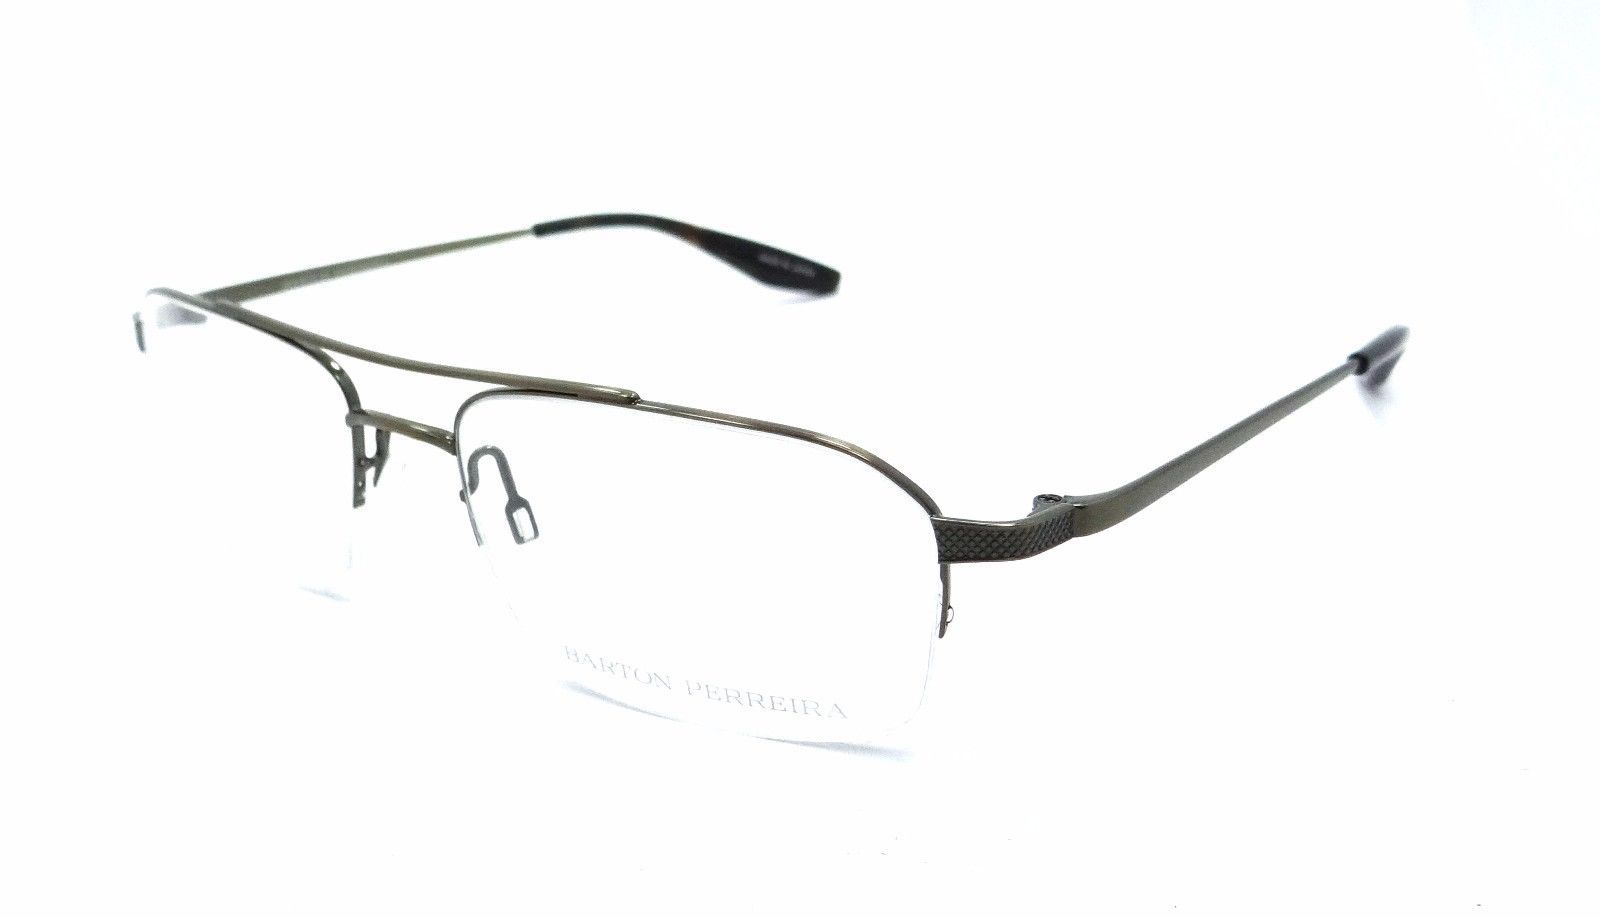 365c510cb3f Barton Perreira RX Eyeglasses Frames Newton and 39 similar items. S l1600